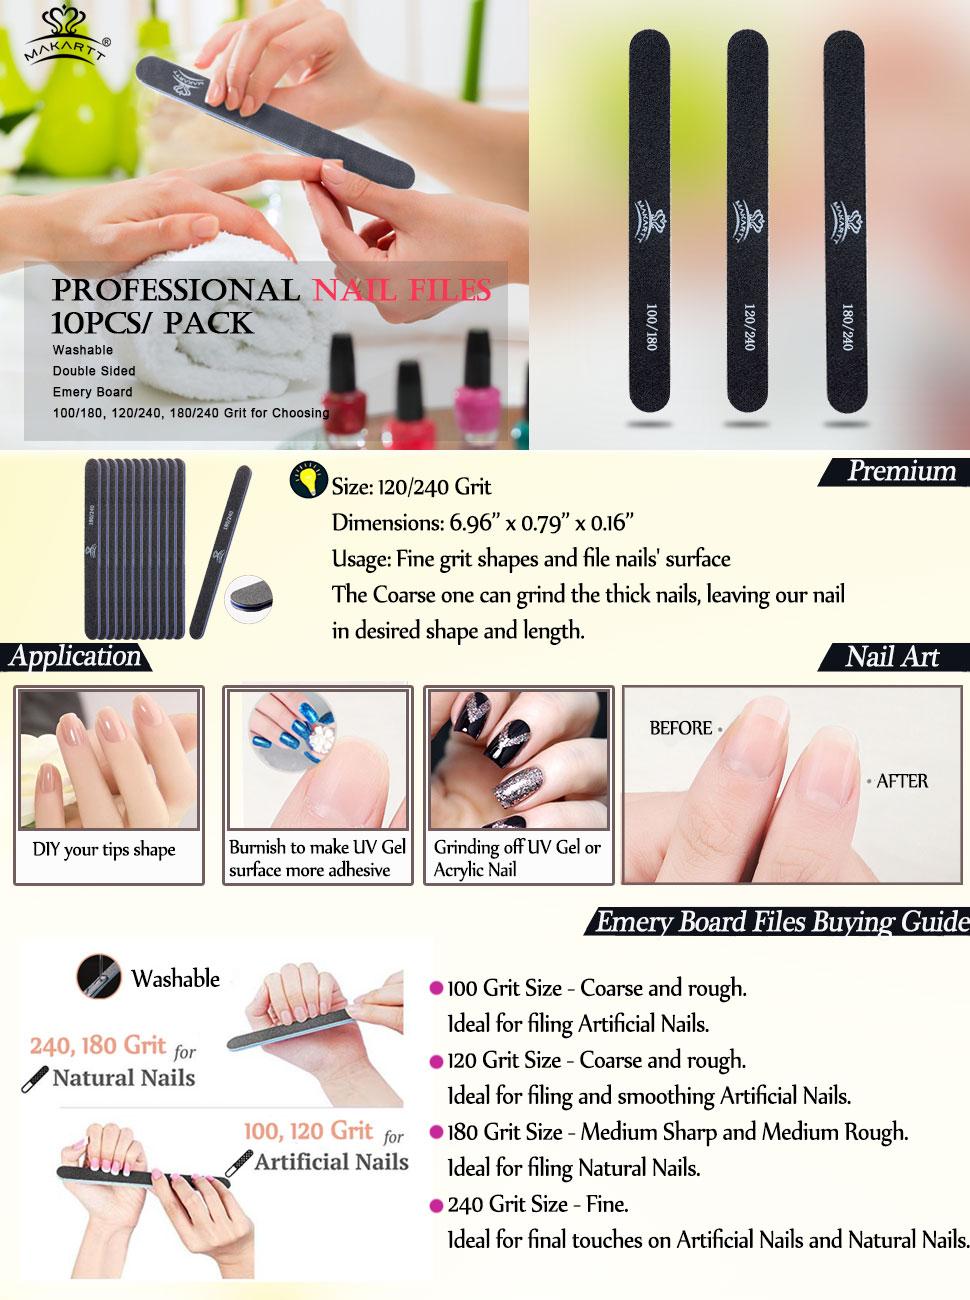 Amazon.com: MAKARTT Professional Nail Files Black Washable Double ...